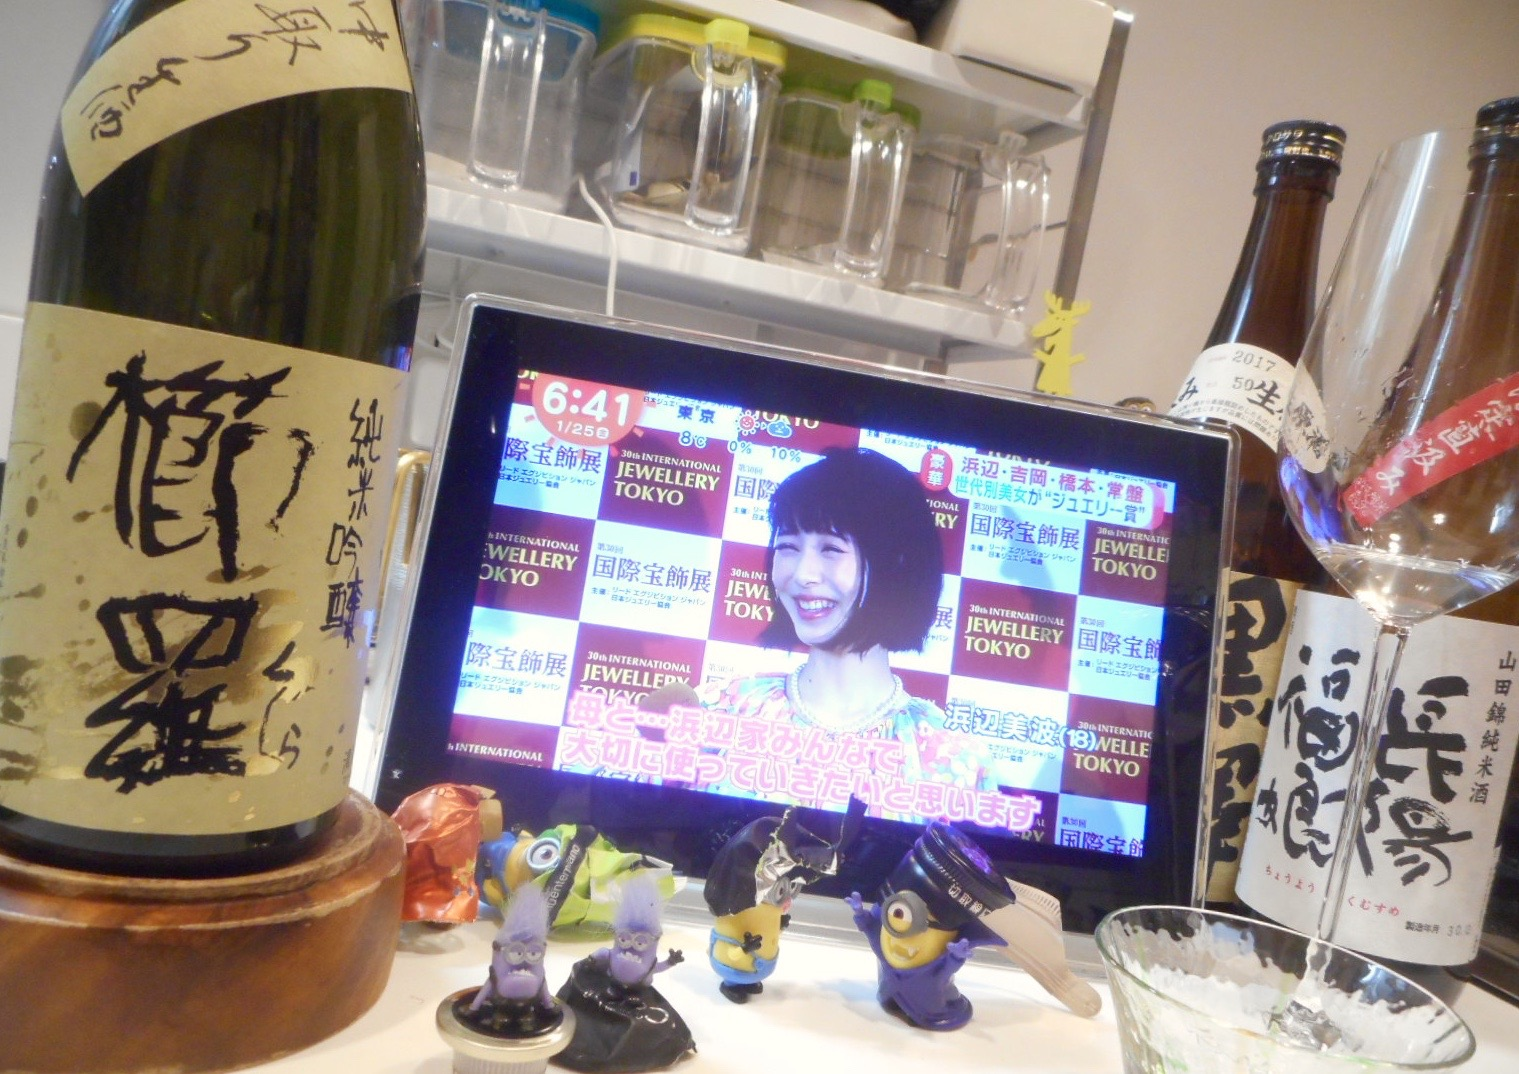 kujira2015_3_1.jpg